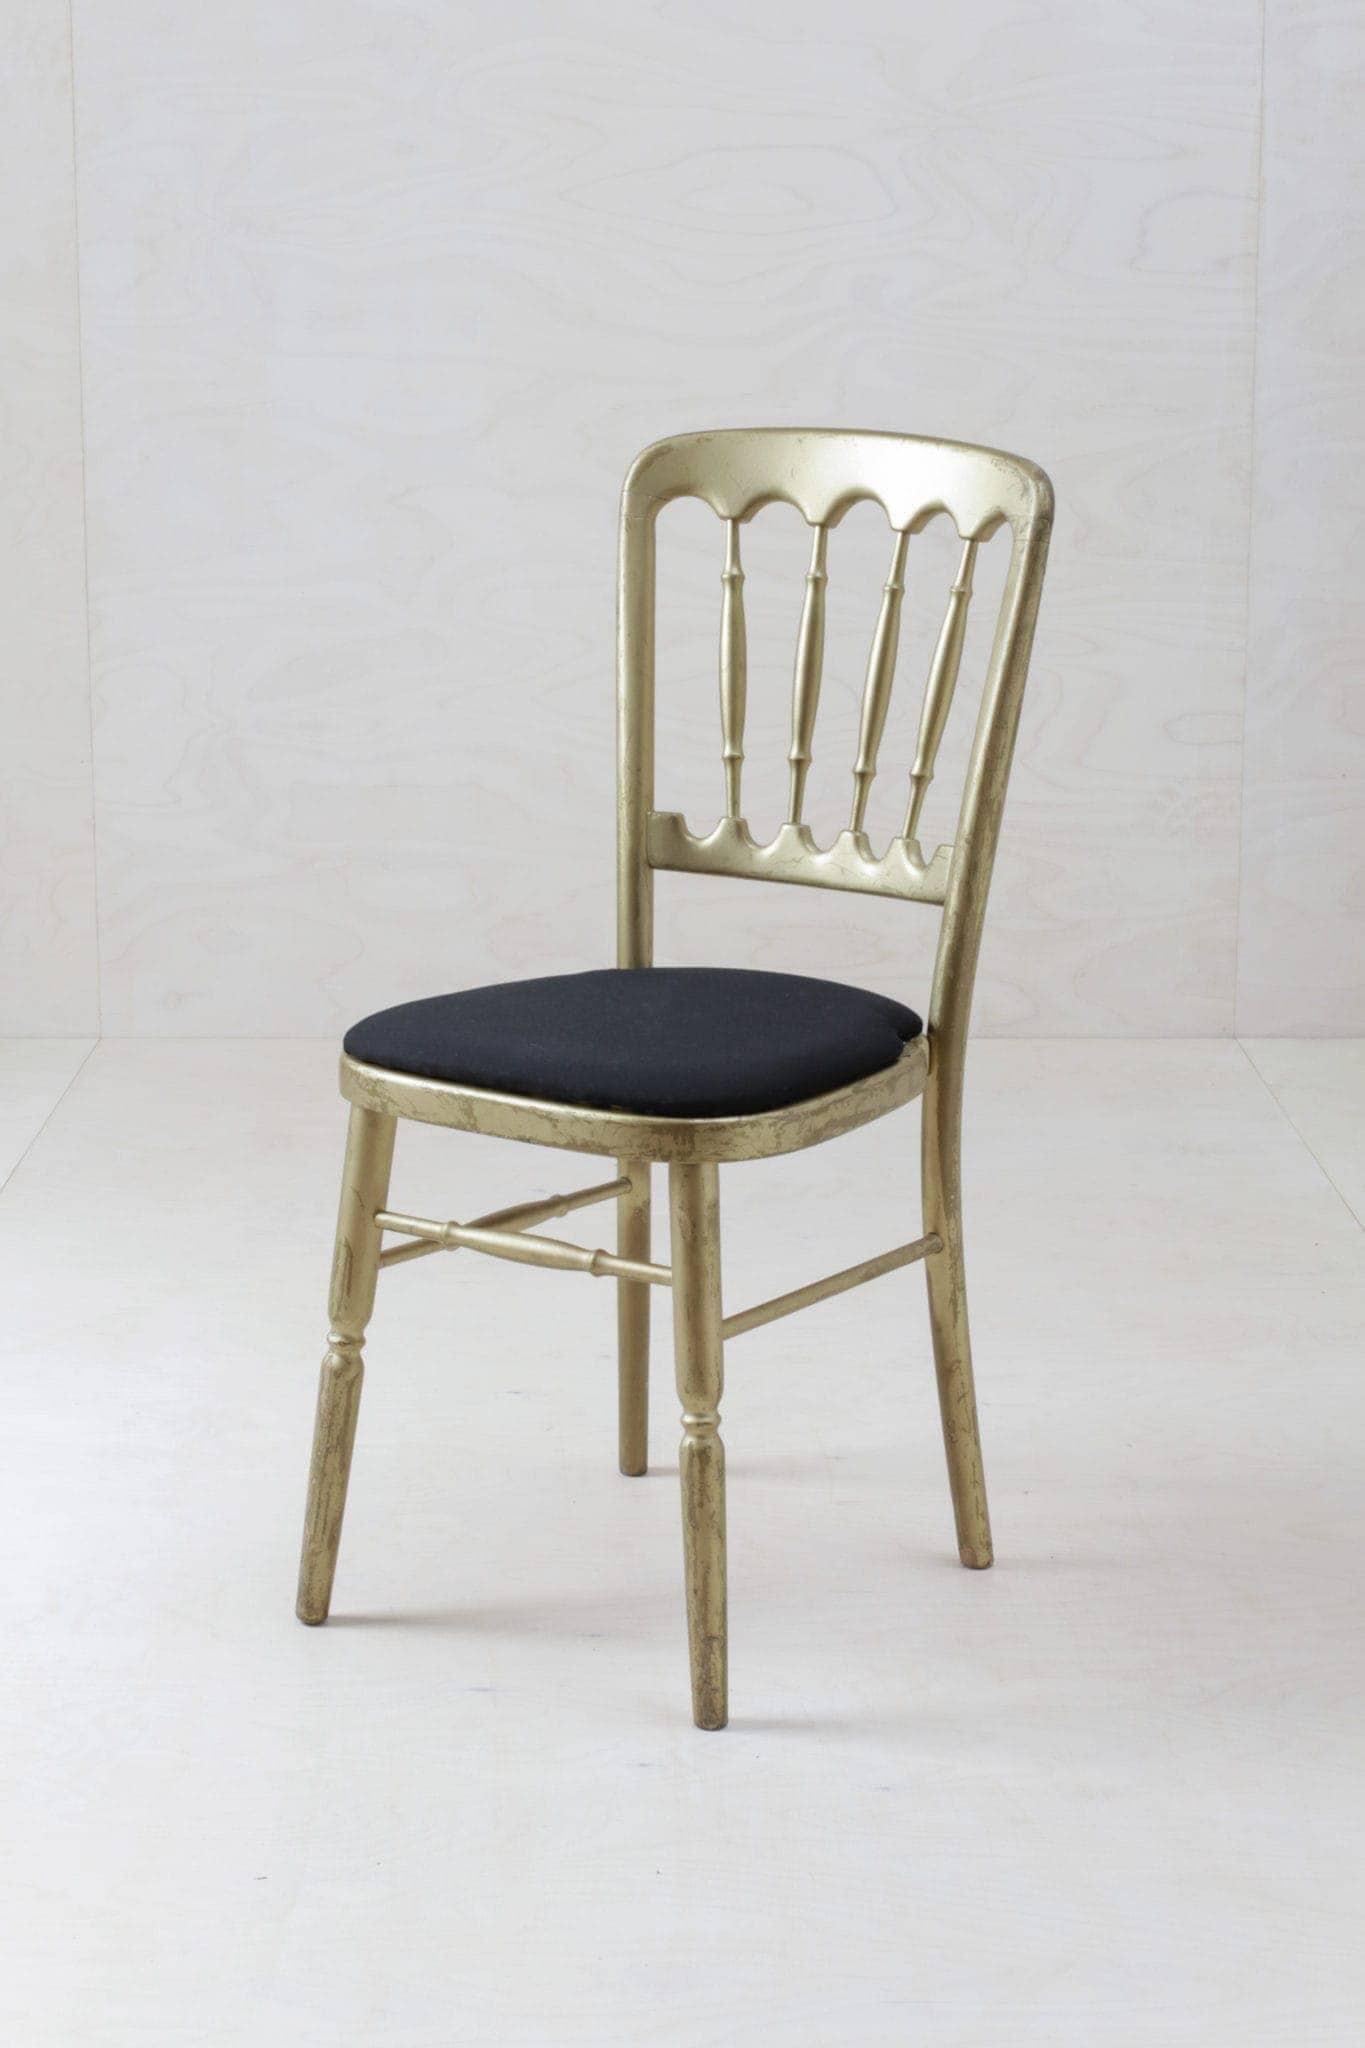 Eventmobiliar mieten, Tische, Stühle, Sofas, Co.